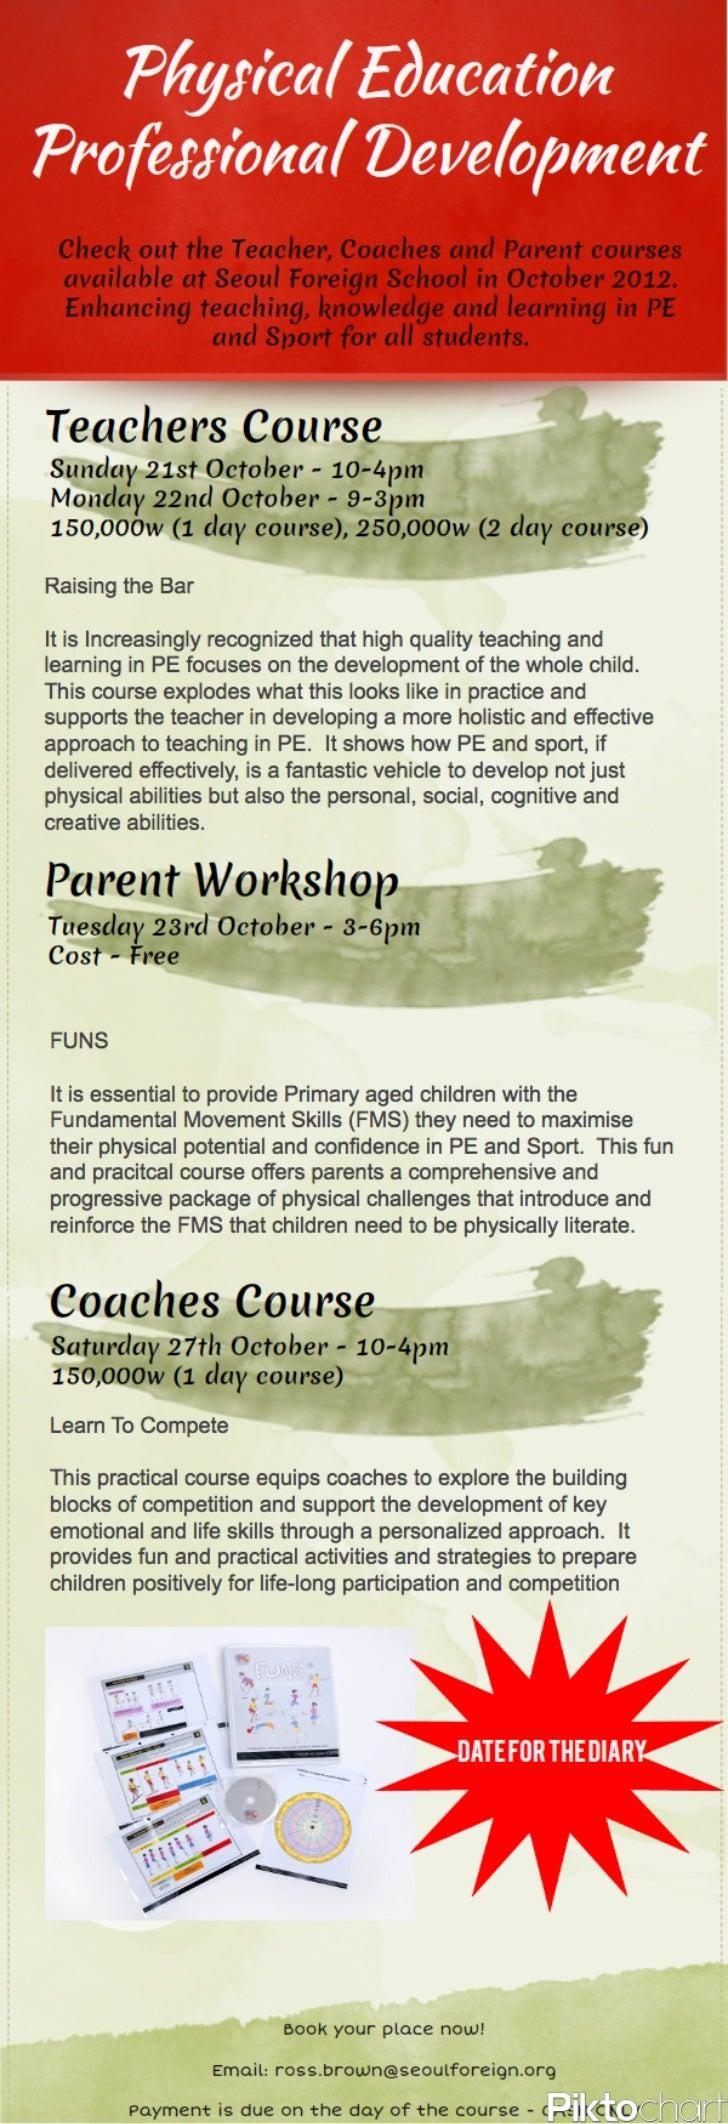 Physical education professional development 2012[1]